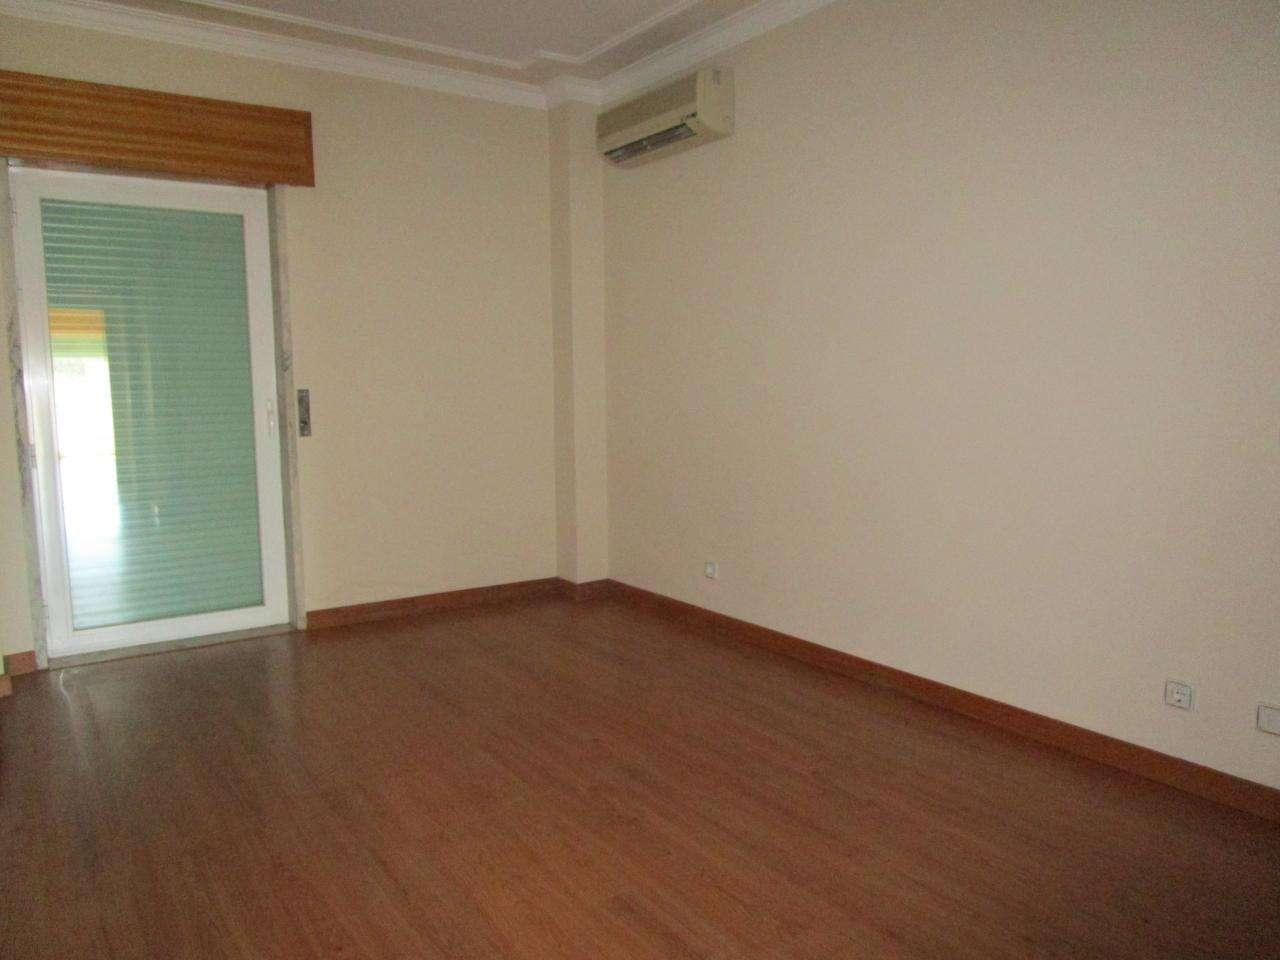 Apartamento para comprar, Vialonga, Vila Franca de Xira, Lisboa - Foto 9